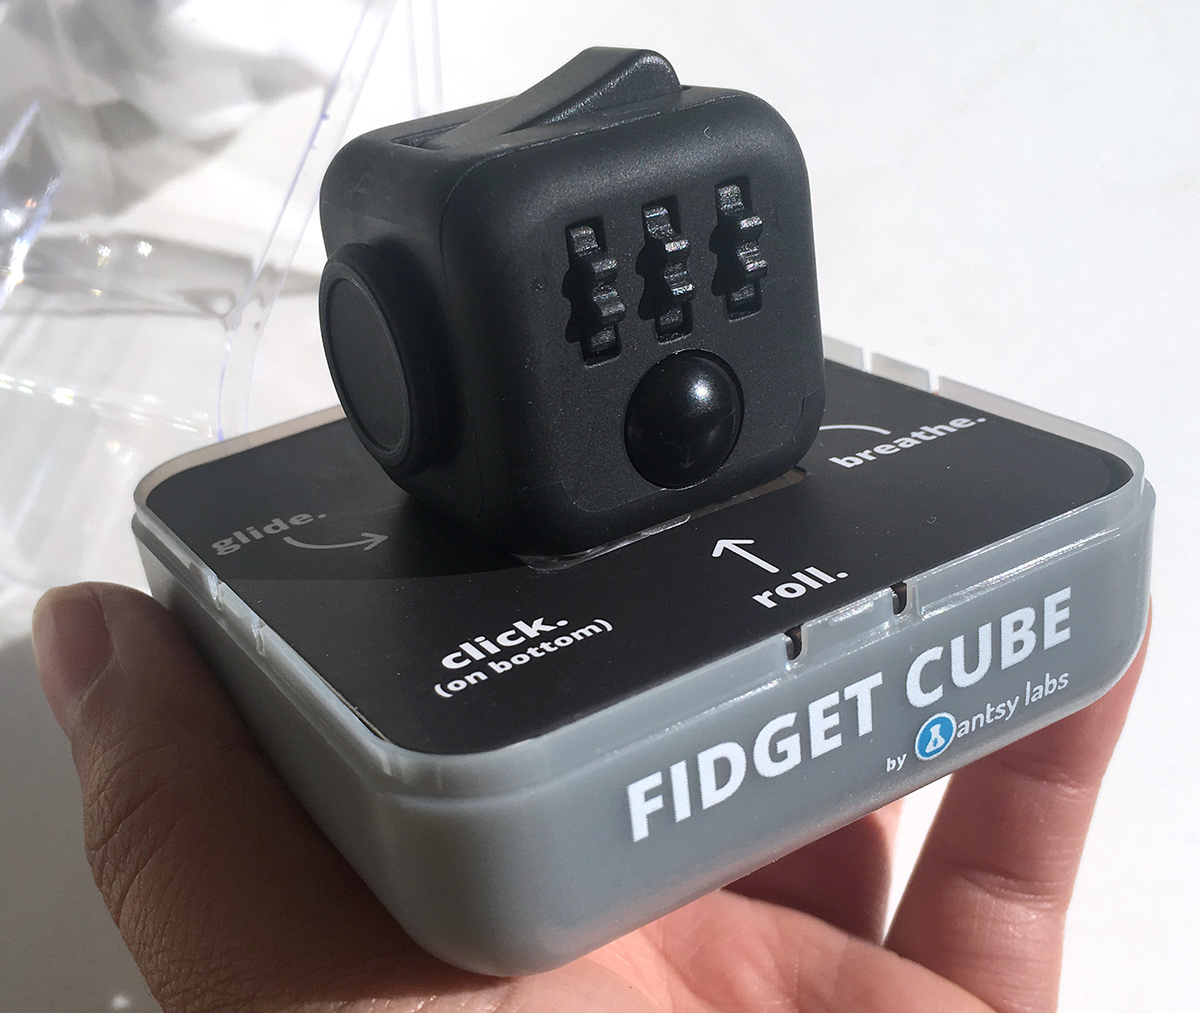 fidget5.jpg